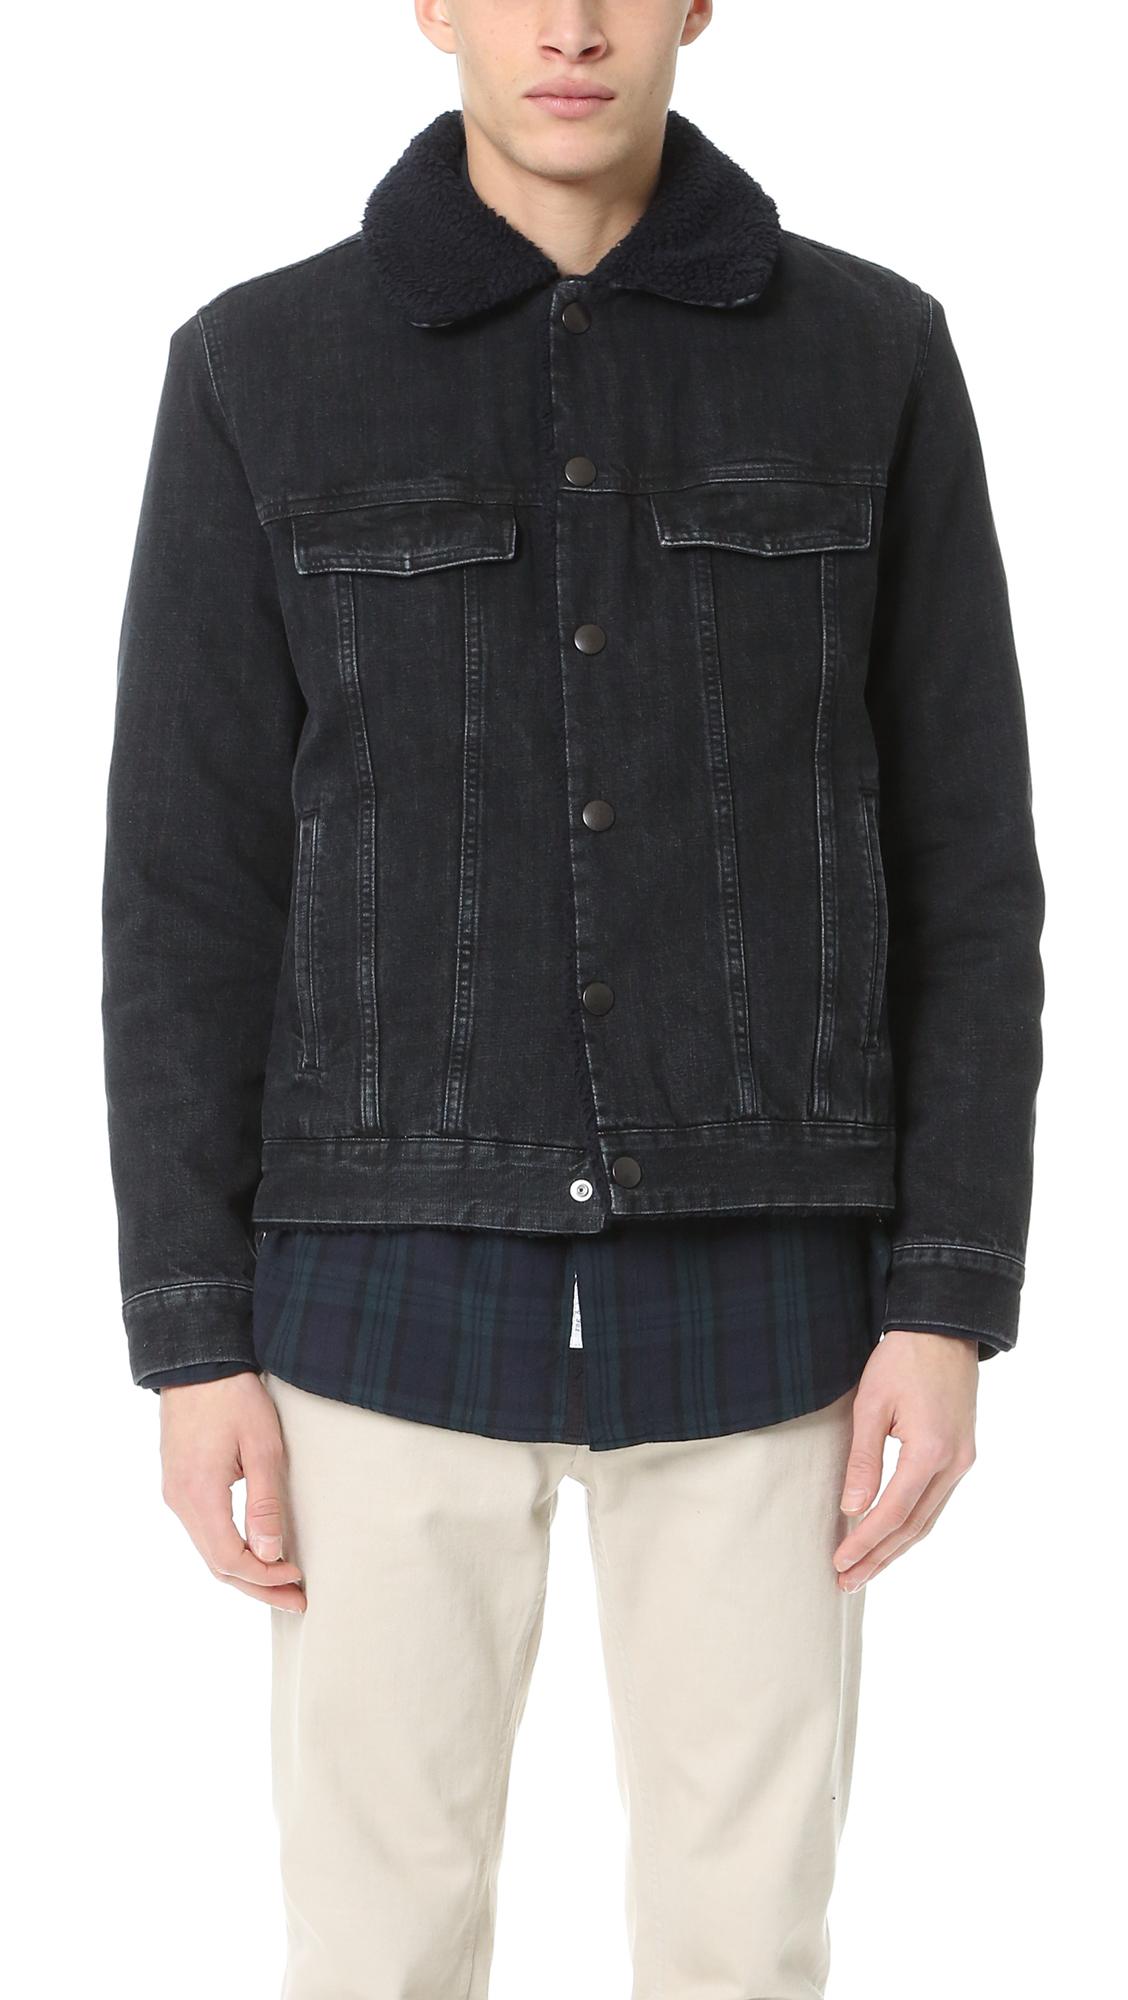 A.P.C. Barry Denim Jacket in Black for Men - Lyst c31dca251c9a